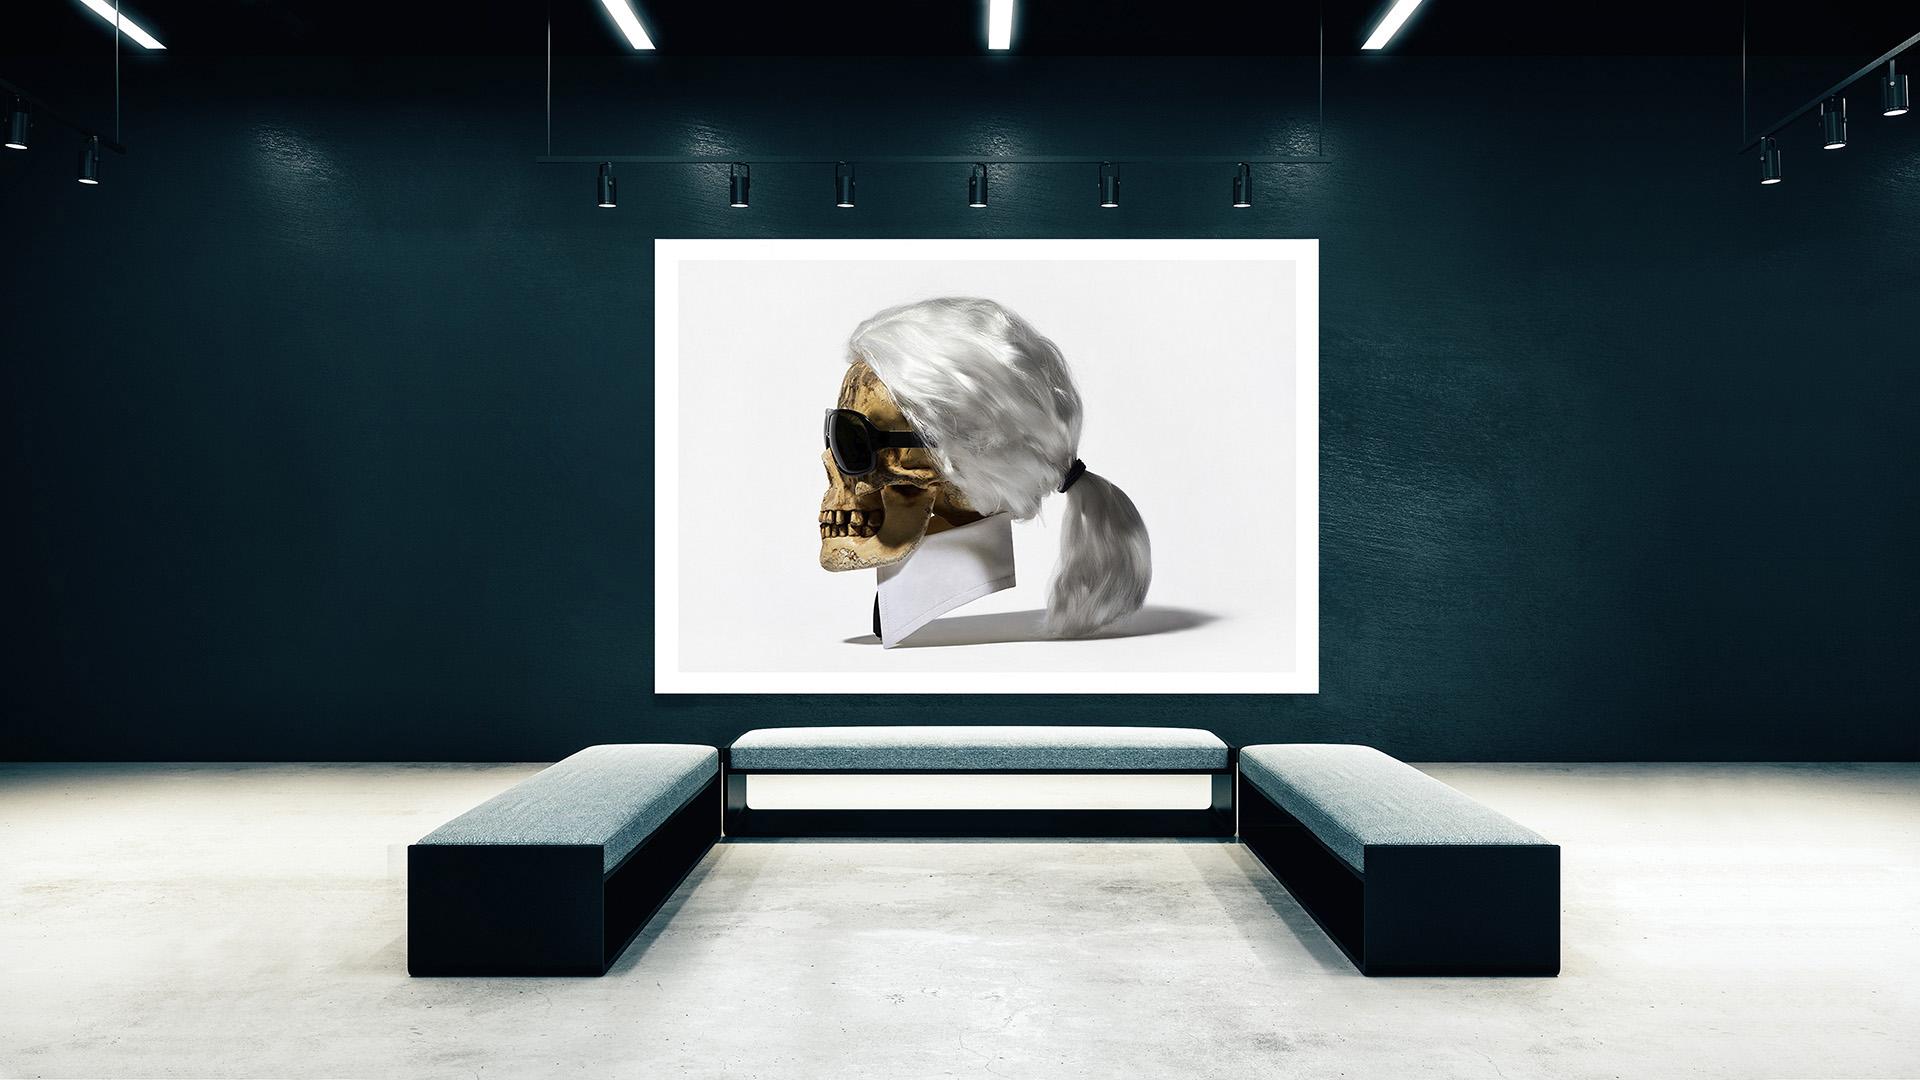 Exposicion-Sintora-Memento-mori-karl-lagerfeld-chanel-Horno-Art-Virtual-Gallery-galeria-arte-fotografia-artistica-decorativa